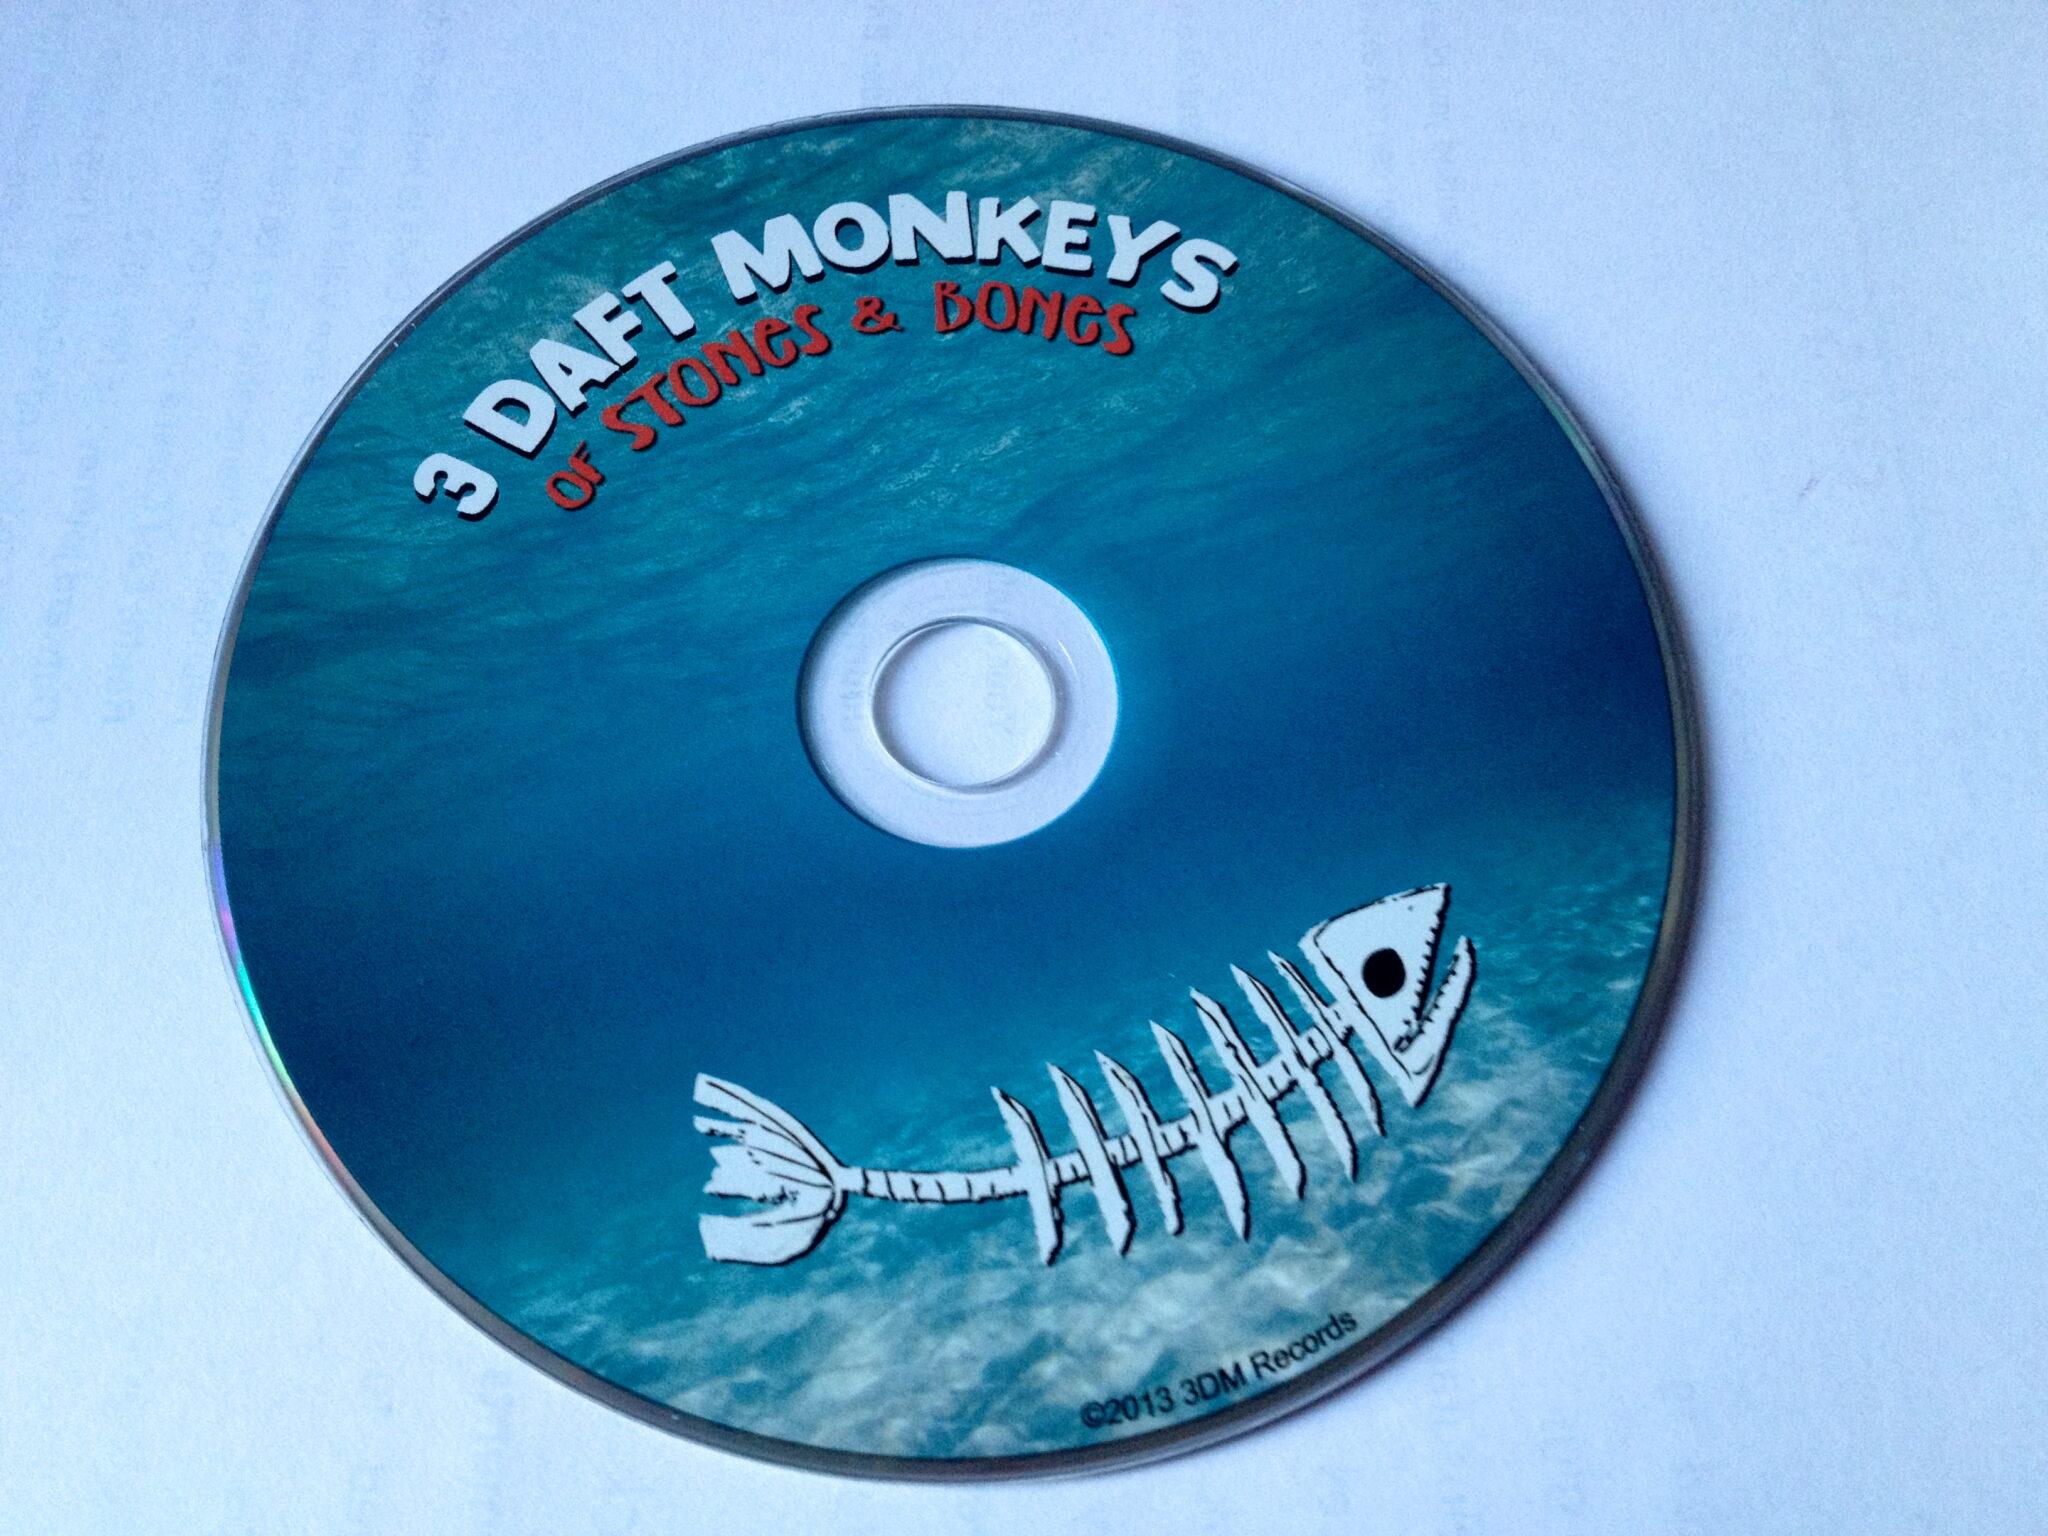 "3 Daft monkeys ""Of Stones and Bones"" CD imagine"